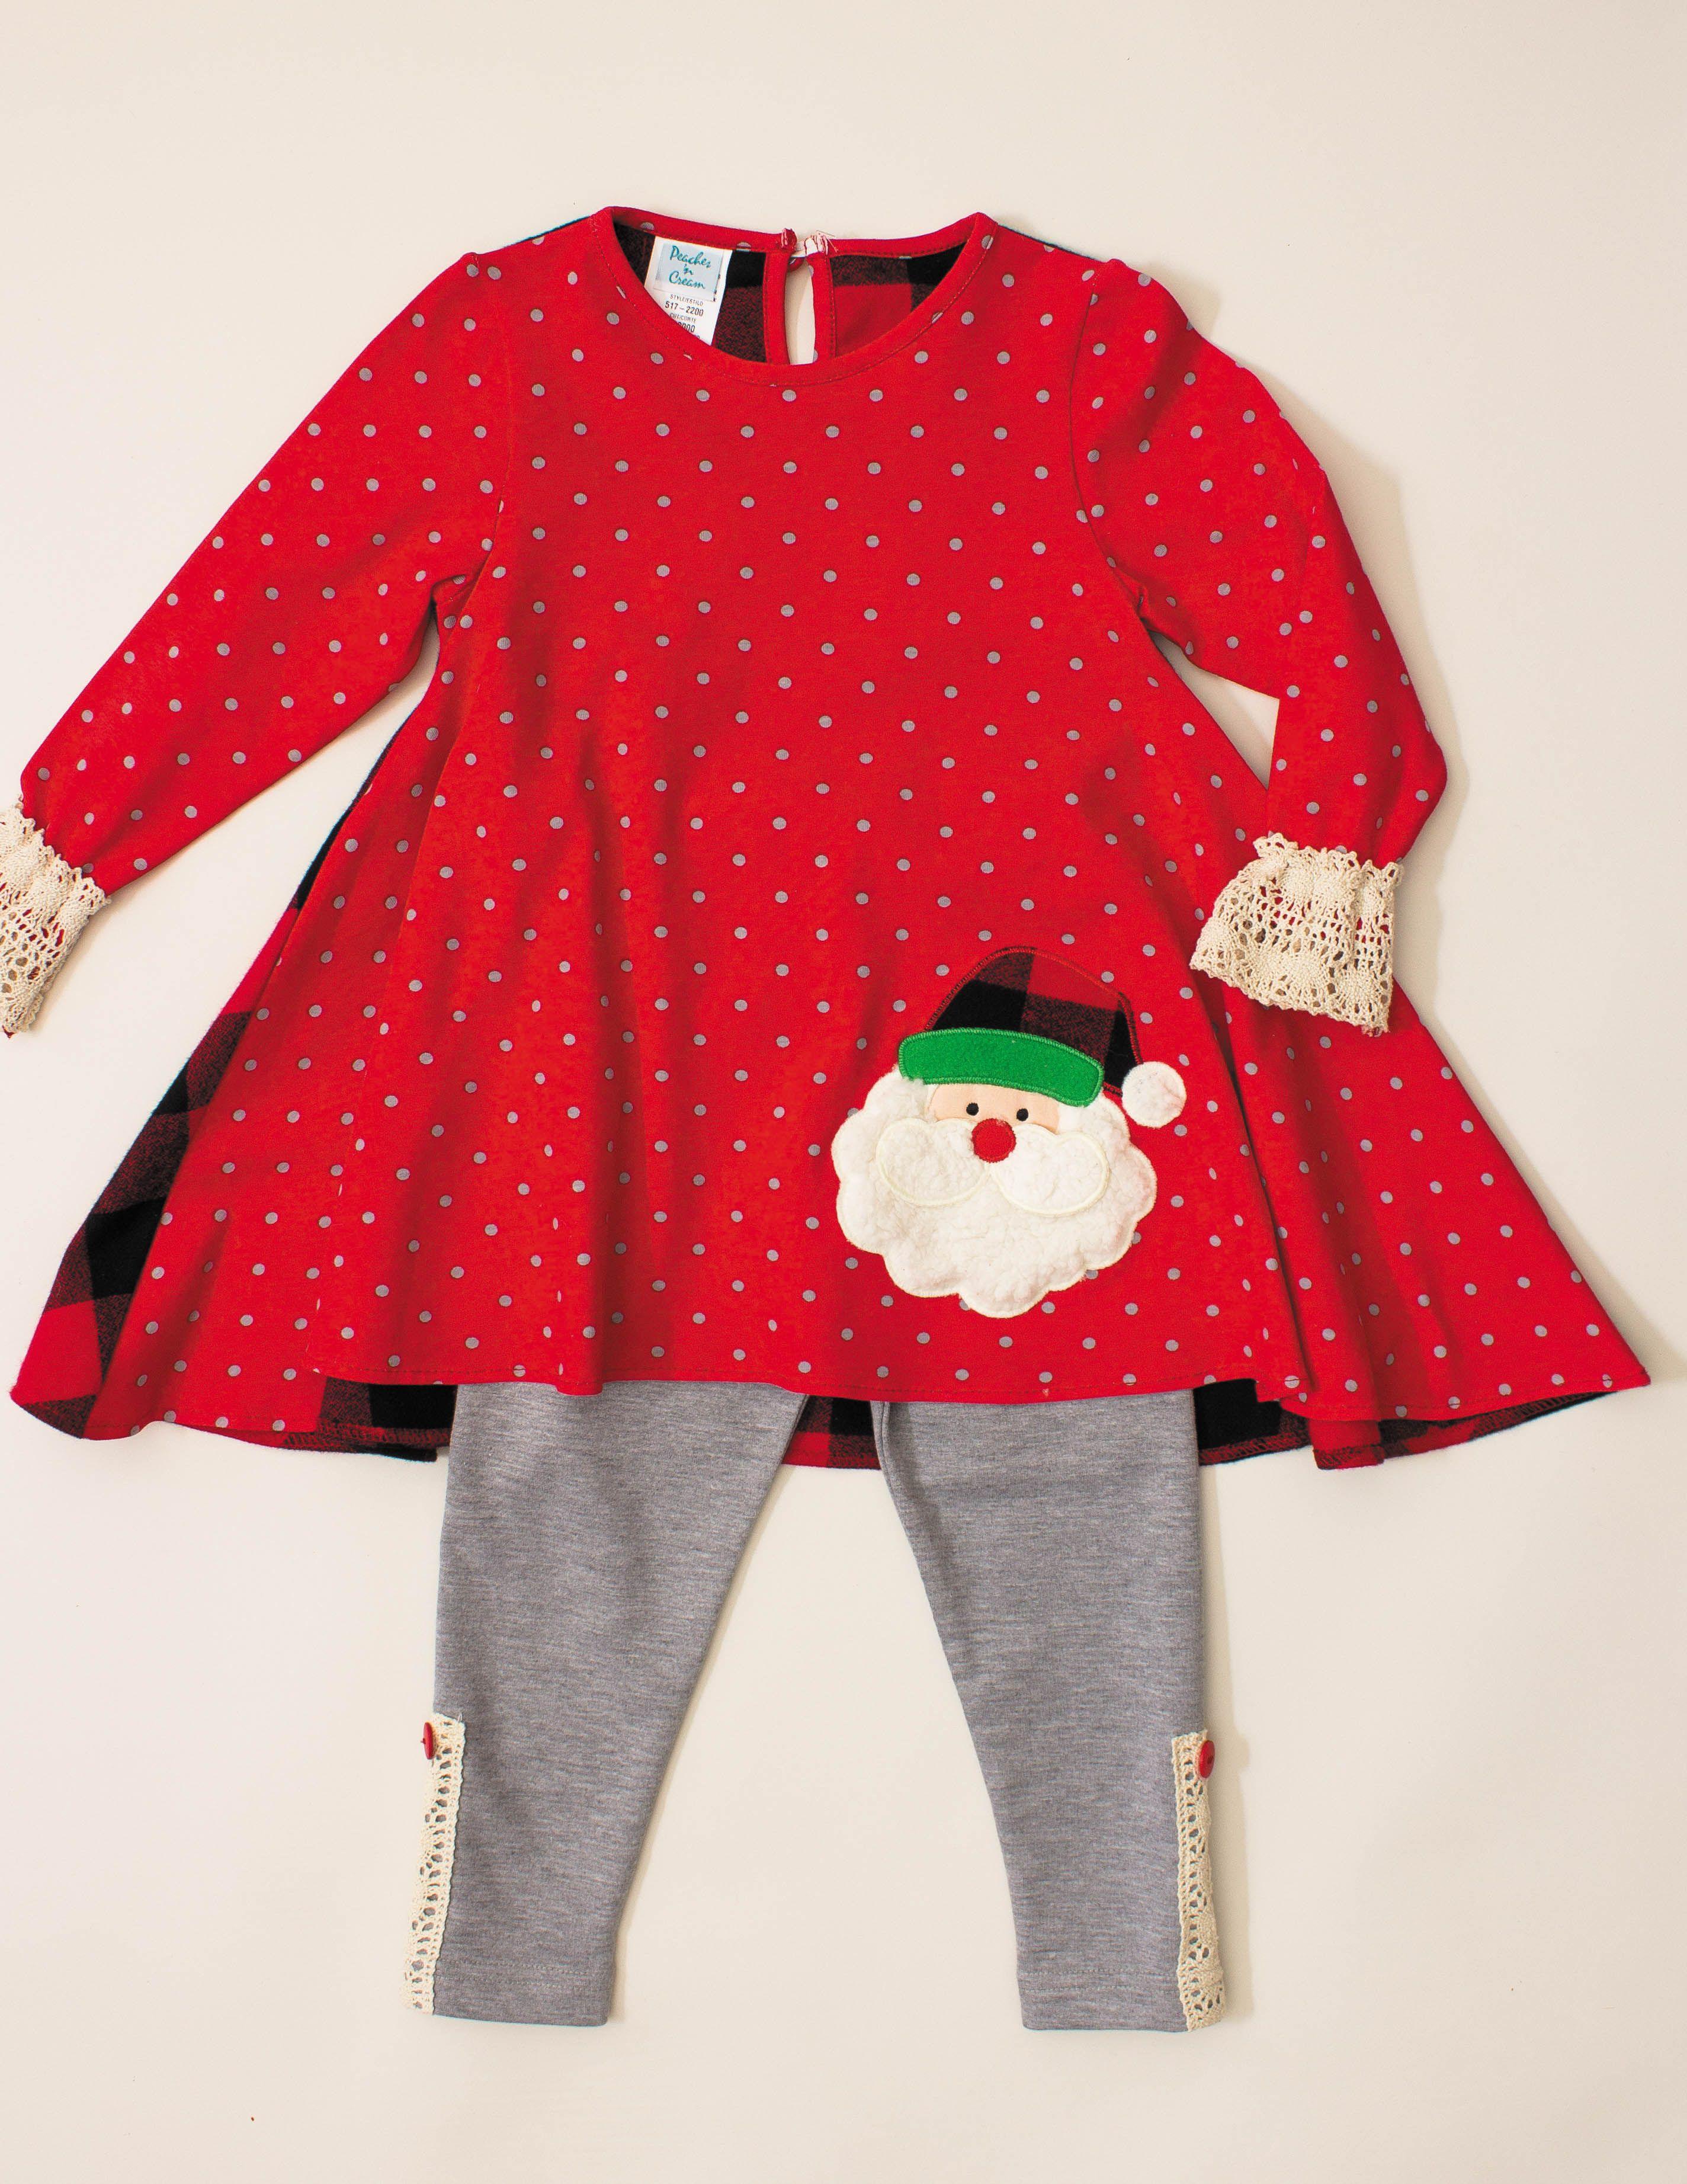 96e8b94cdce894 Peaches n' Cream Christmas 2 Piece Set Toddler   Christmas for Girls ...